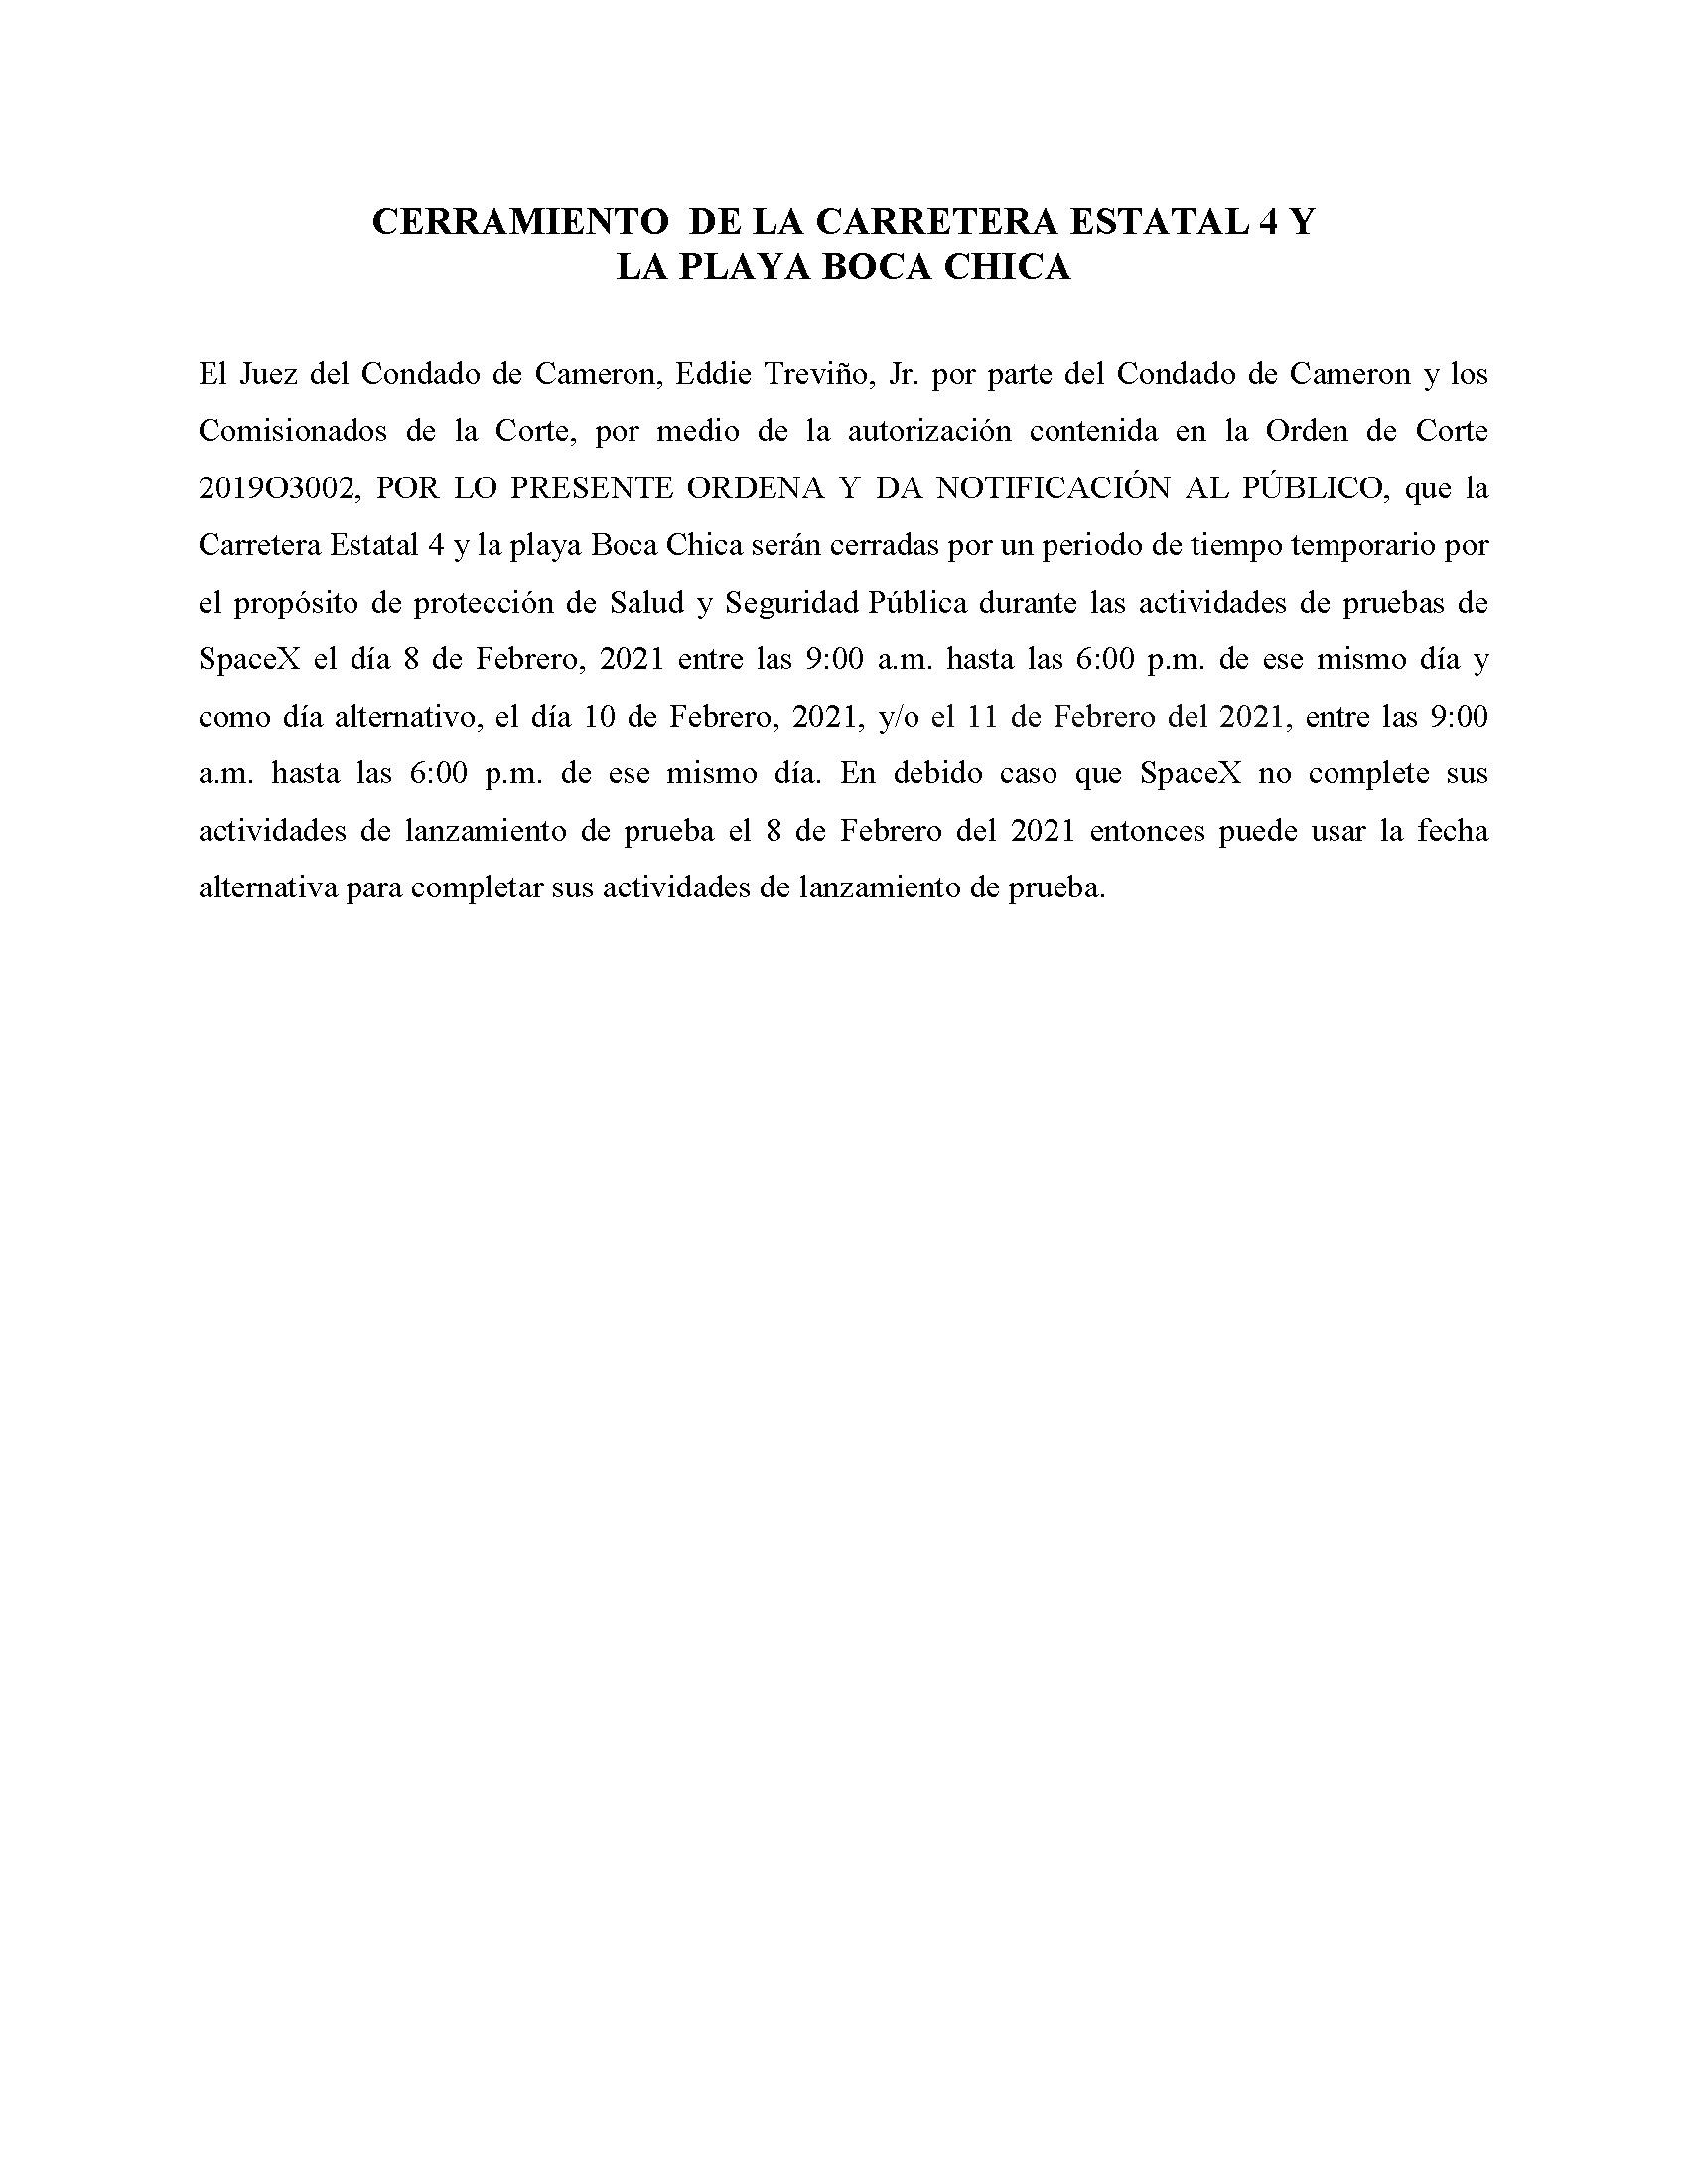 SpaceX Closure Spanish Español